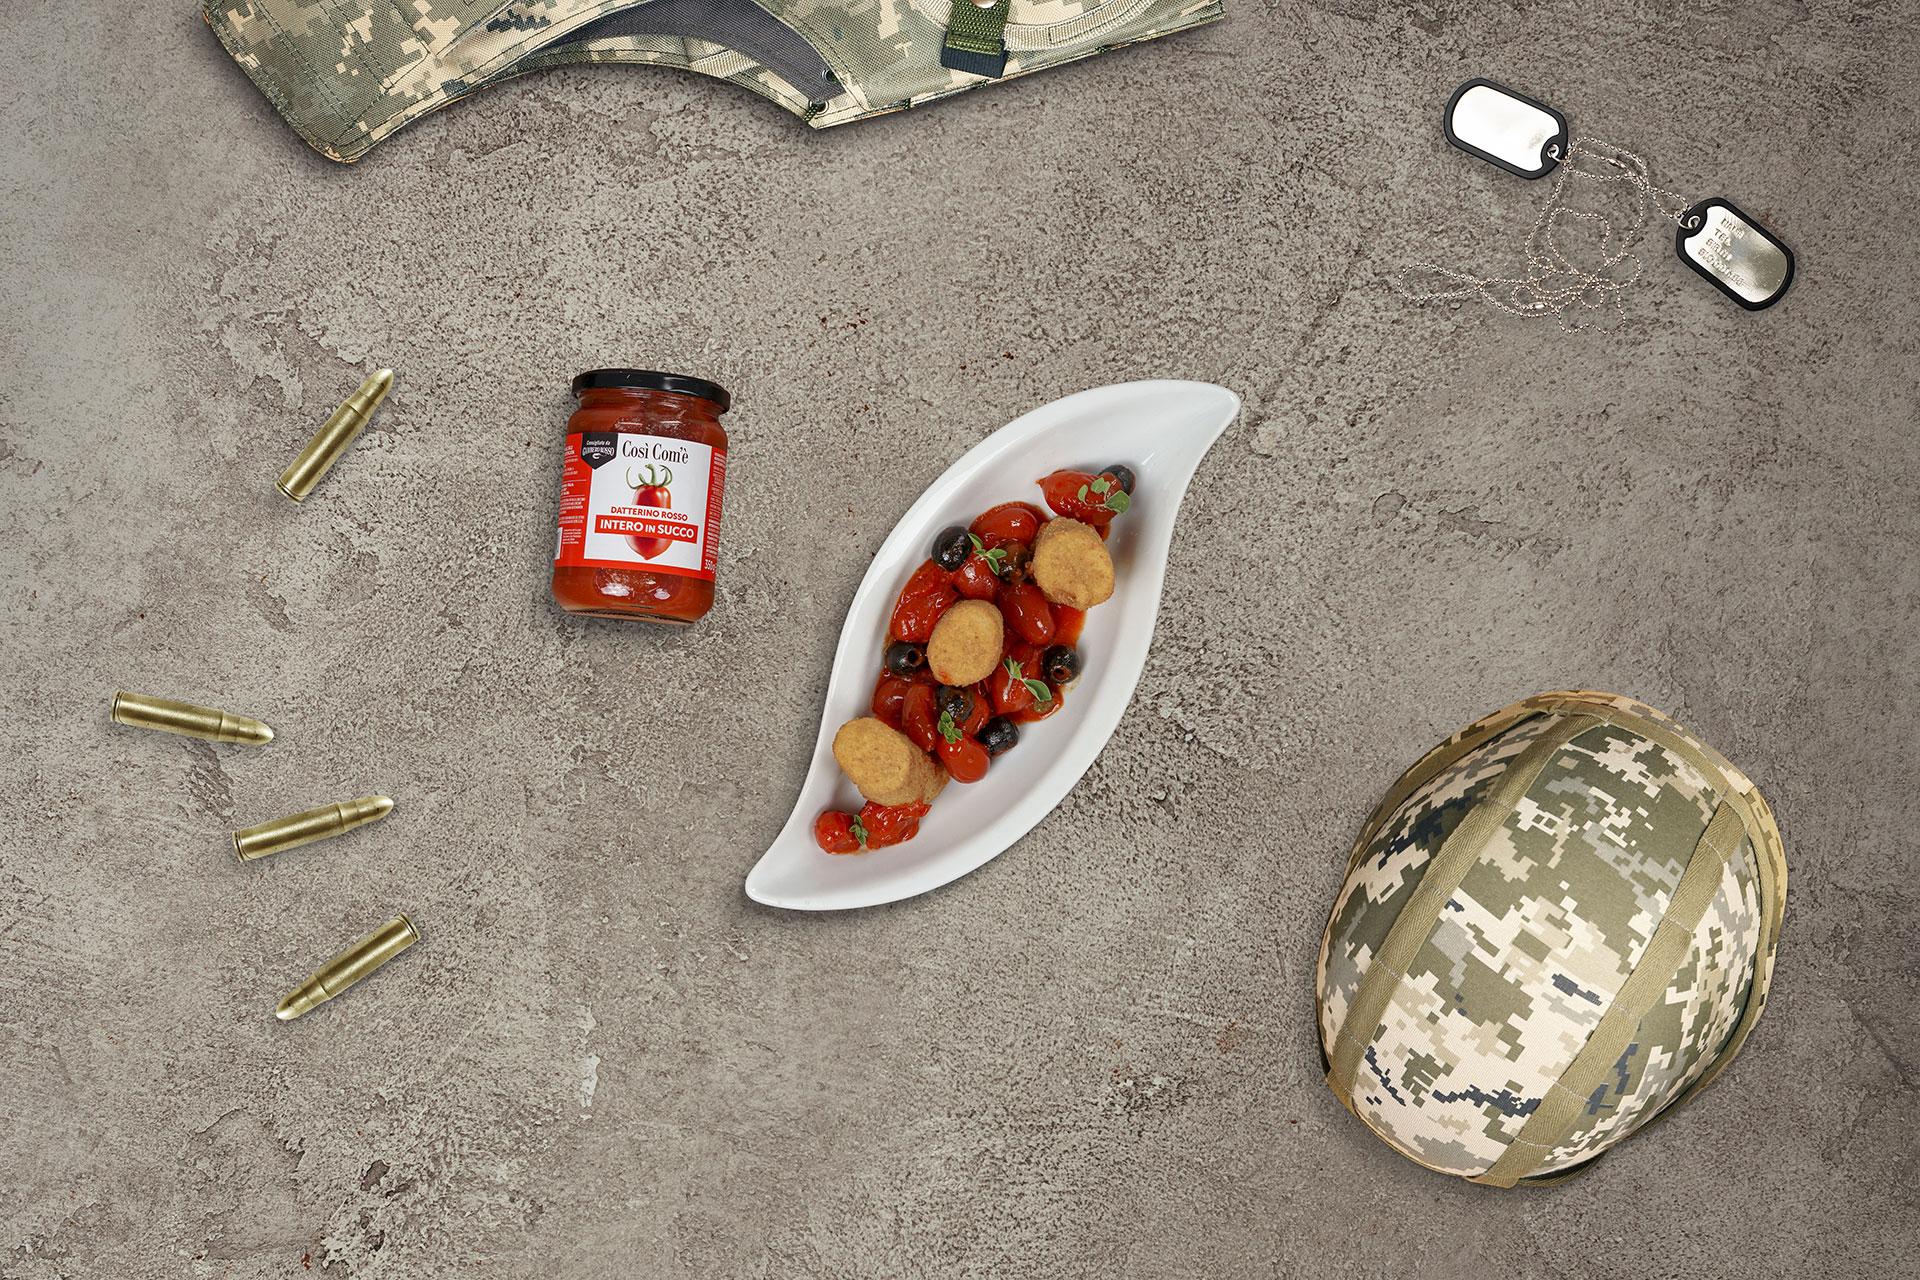 Full Metal Jacket: Paccheri fritti con Datterino Rosso, baccalà e patate